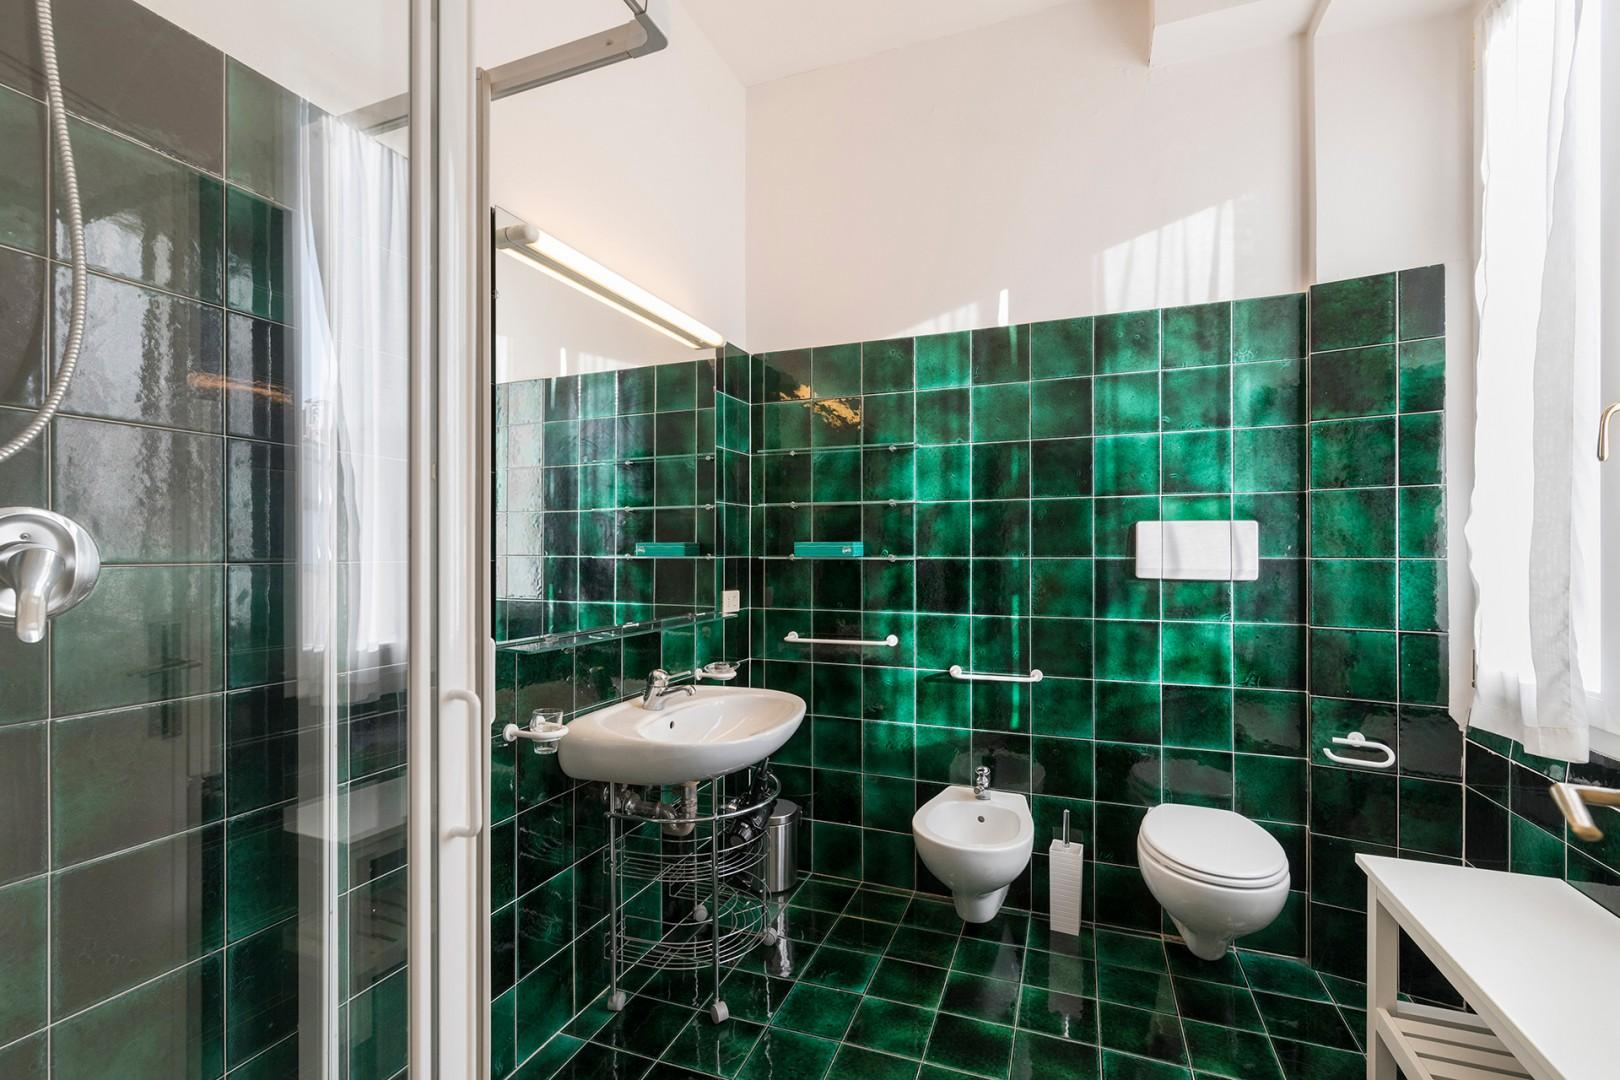 Bathroom 2 with a shower en suite to bedroom 3.